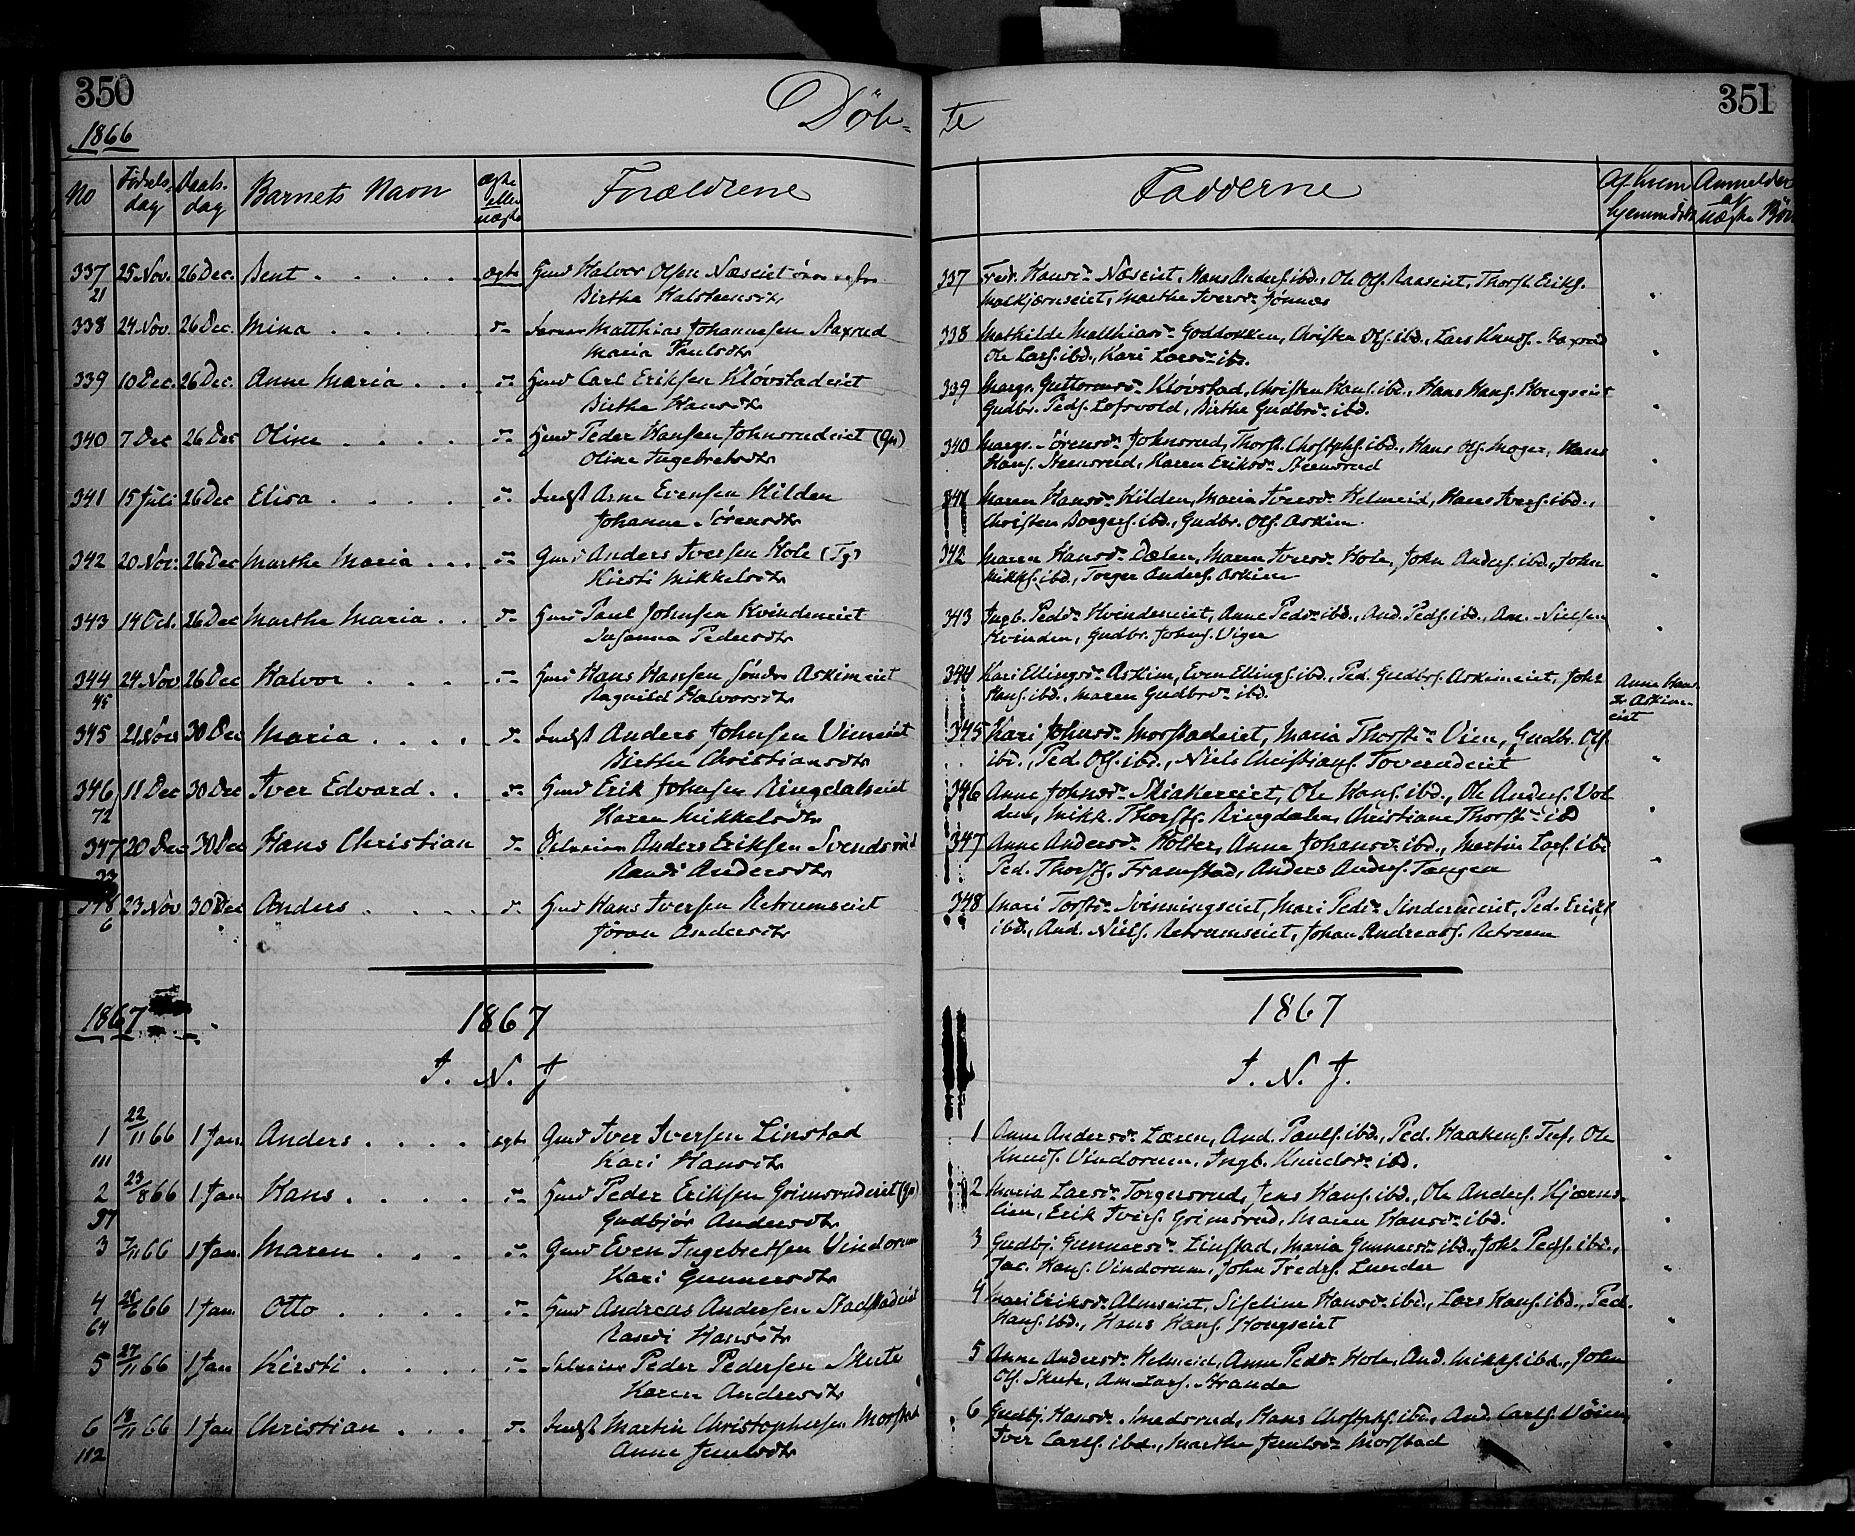 SAH, Gran prestekontor, Ministerialbok nr. 12, 1856-1874, s. 350-351